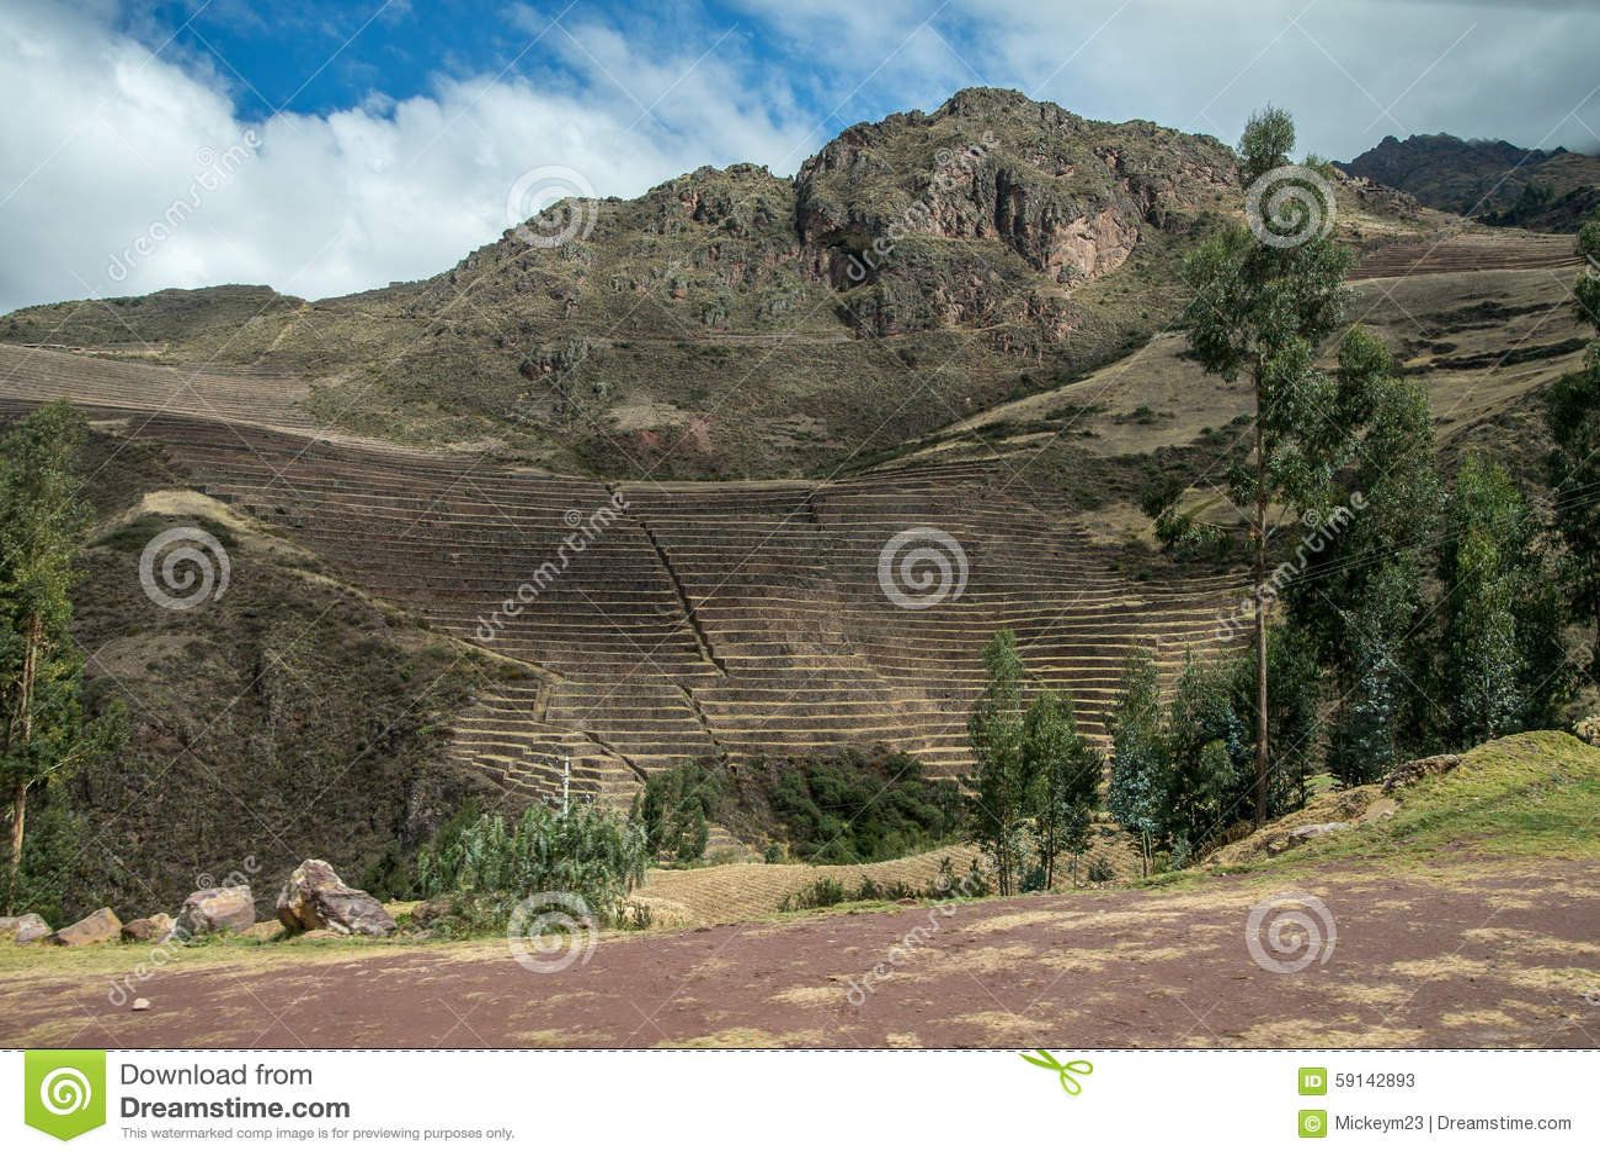 Peru - Overview